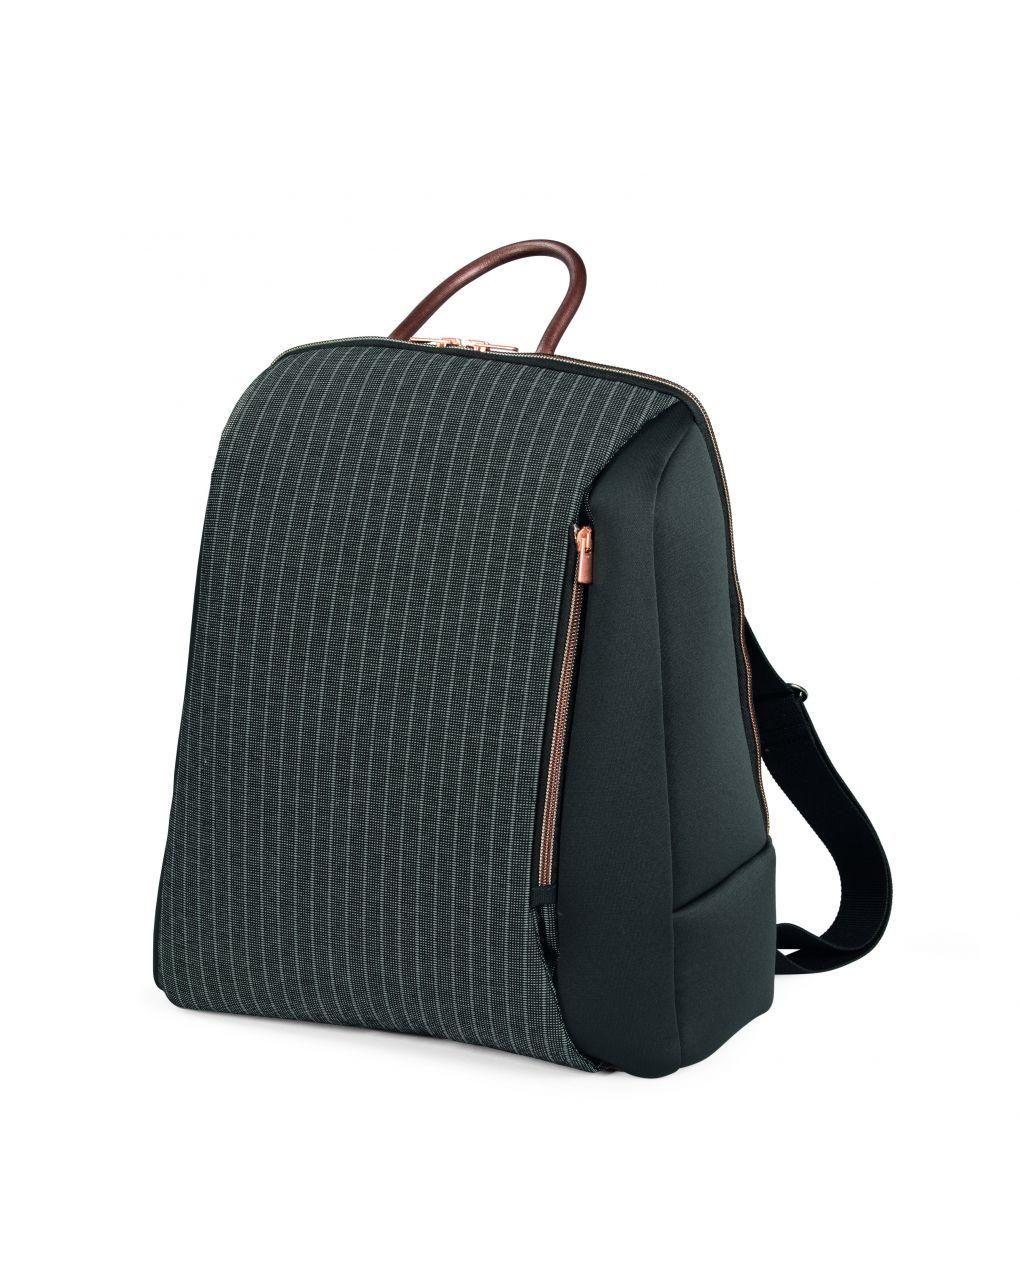 Peg Perego Τσάντα Αλλαξιέρα Back Pack  2021 500 Fiat